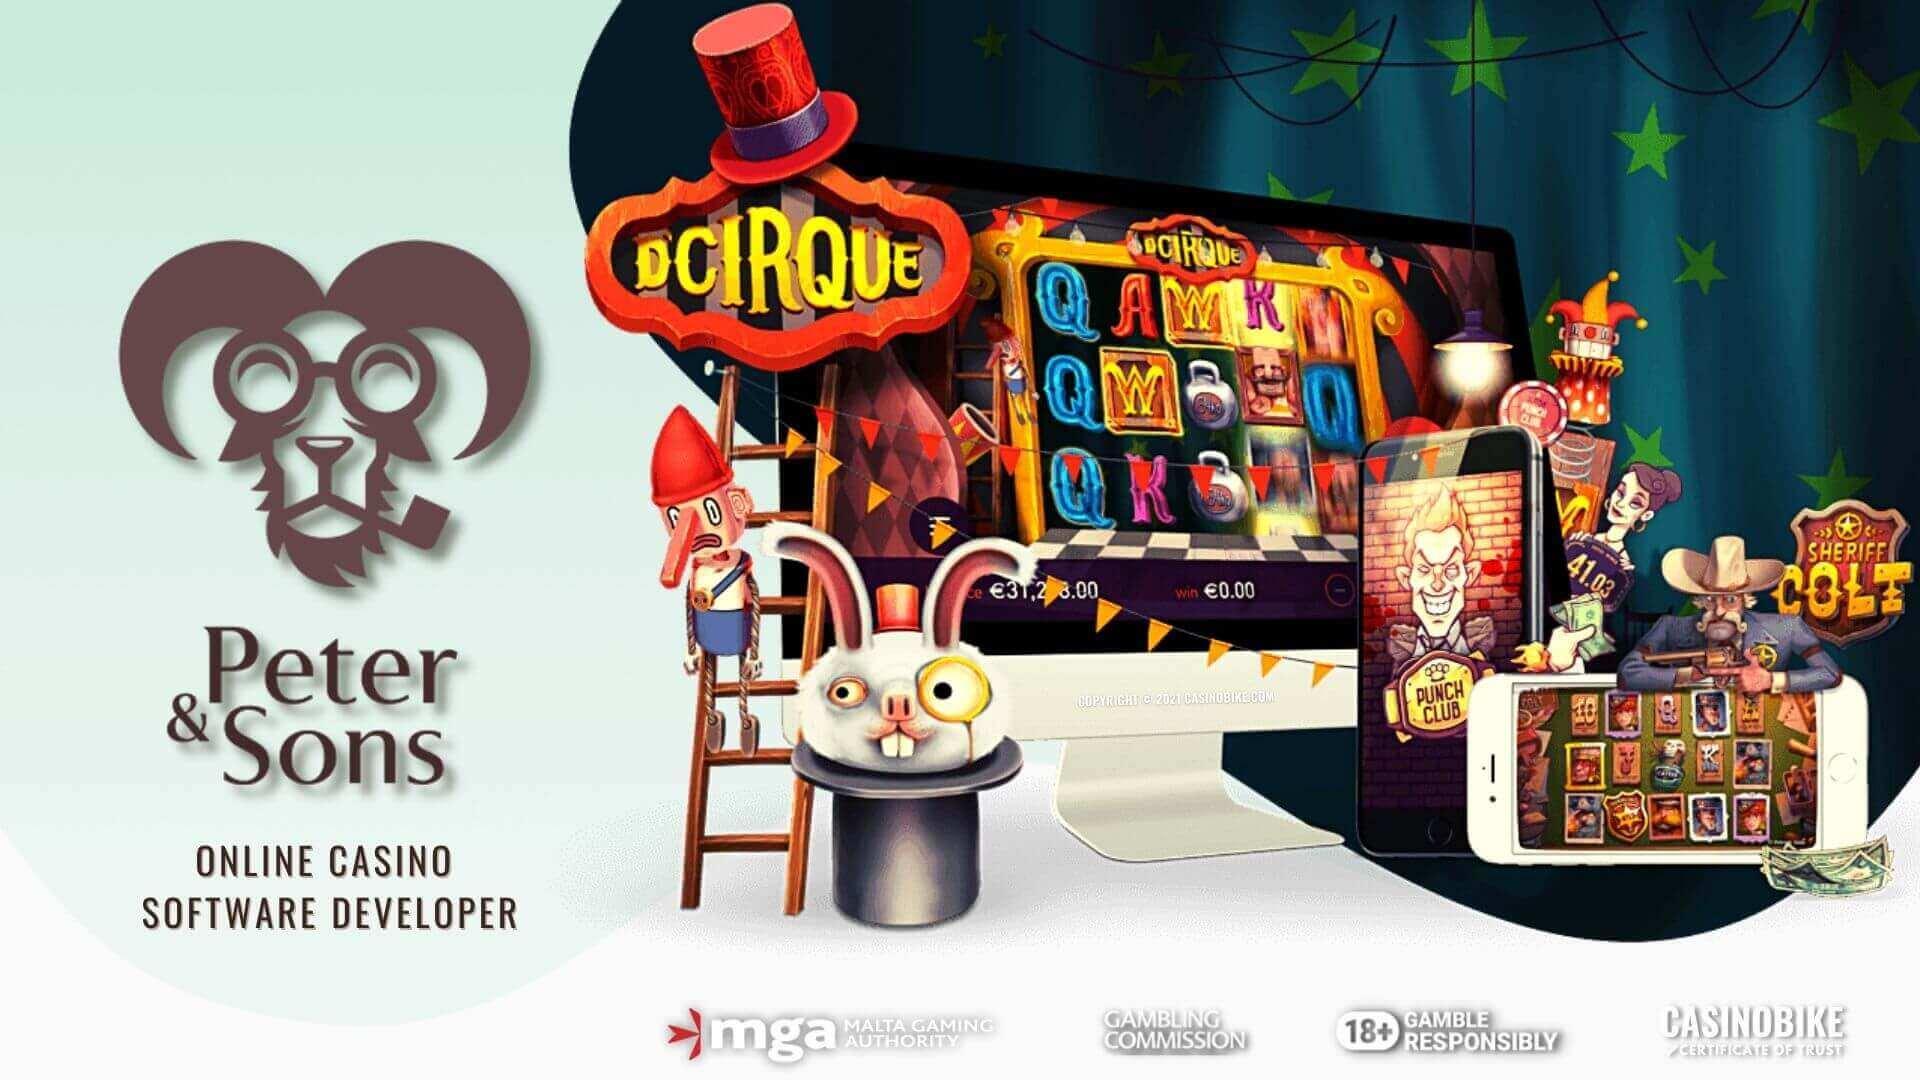 Peter & Sons Online Casino Software Developer